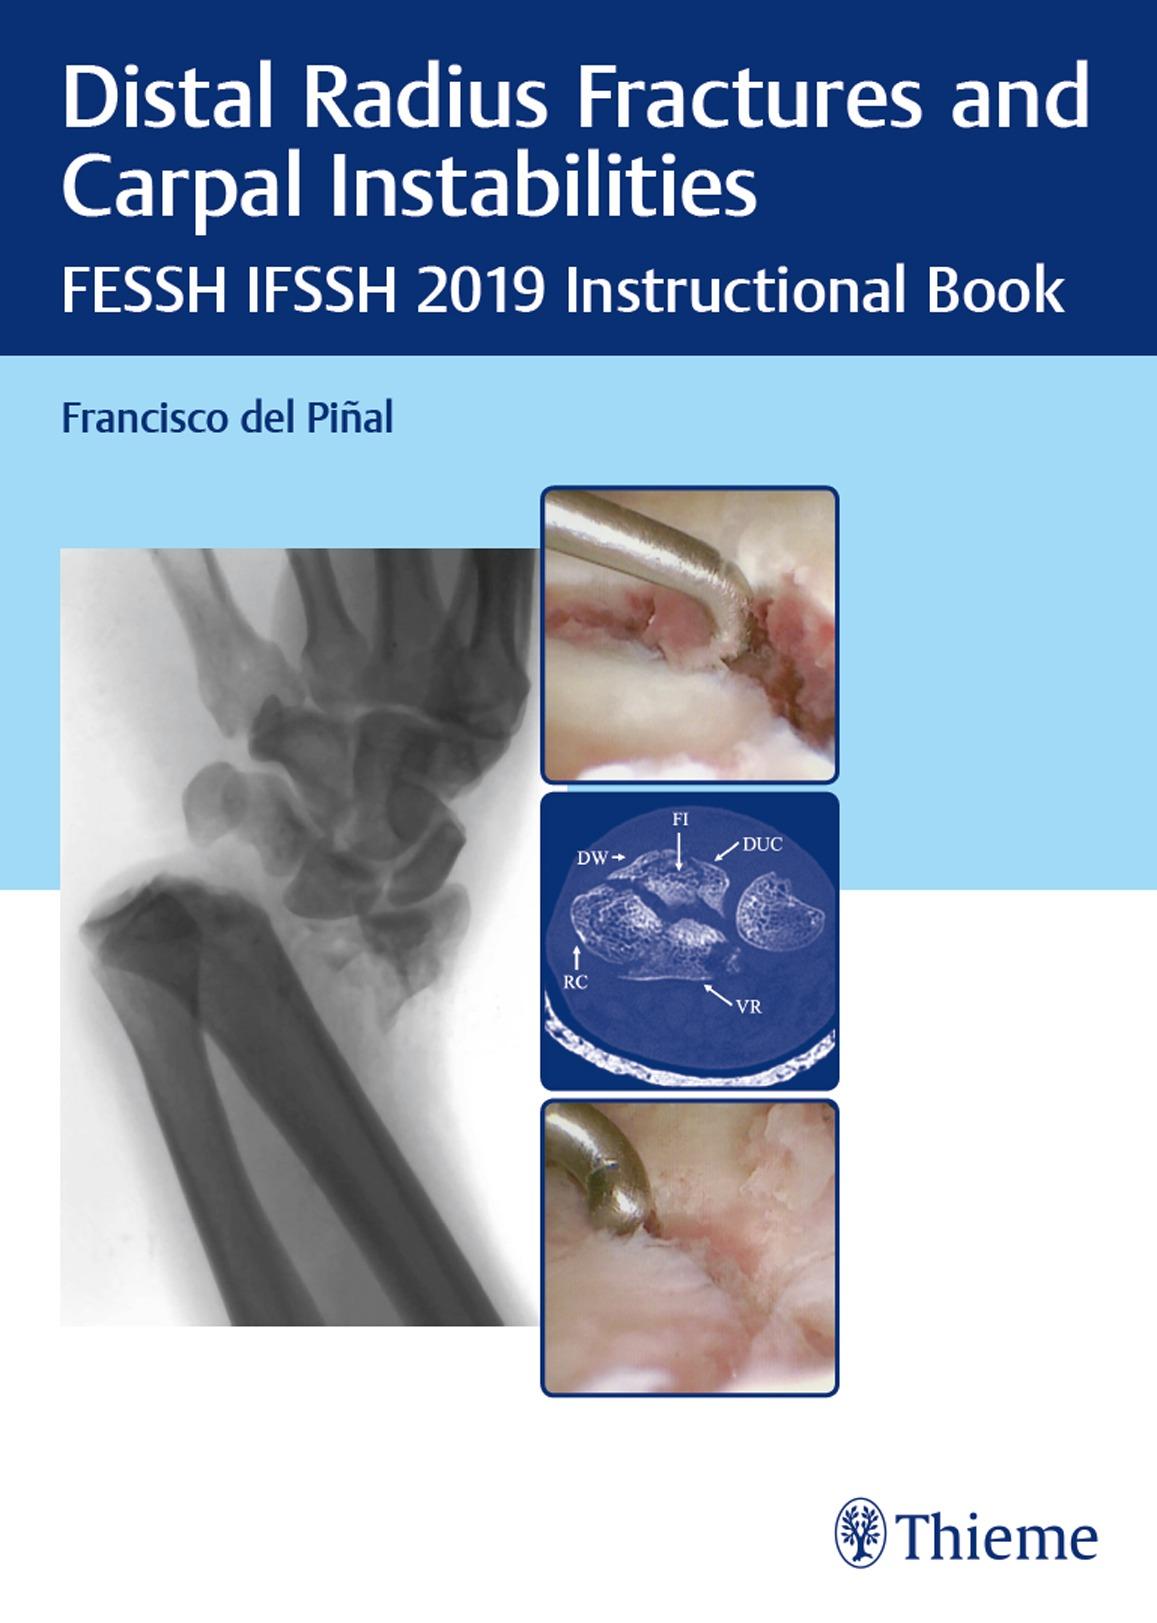 Distal radius fractures and carpal instabilities_01_20190718